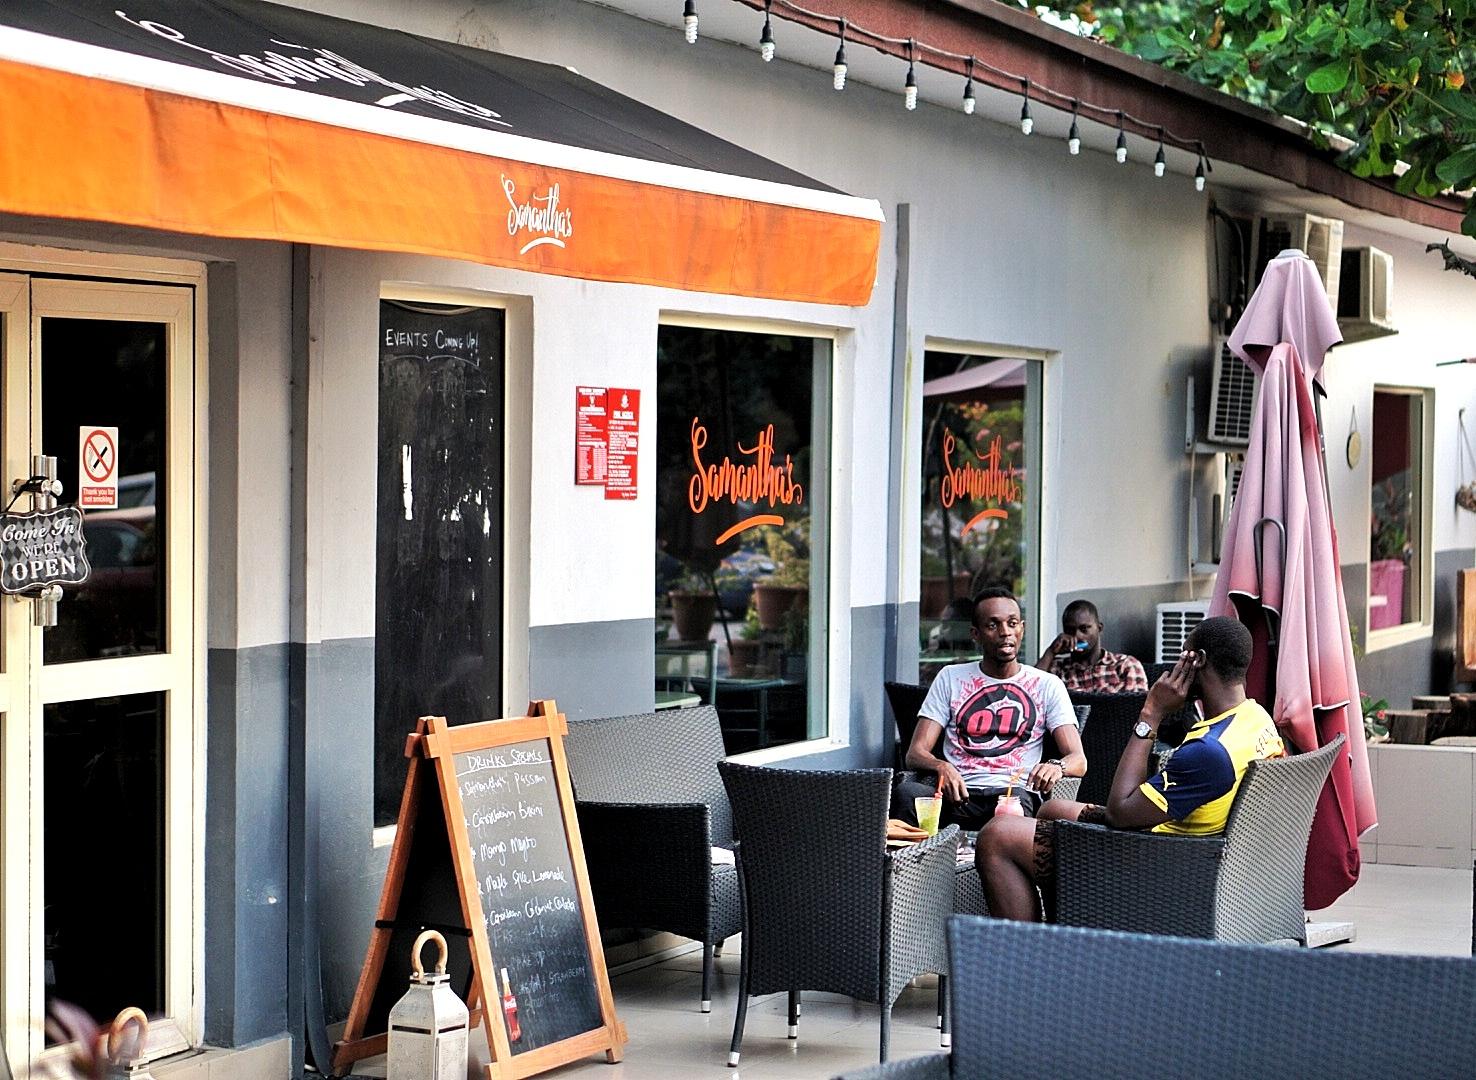 Outdoor sitting area at Samantha's Bistro in Ikoyi, Lagos.